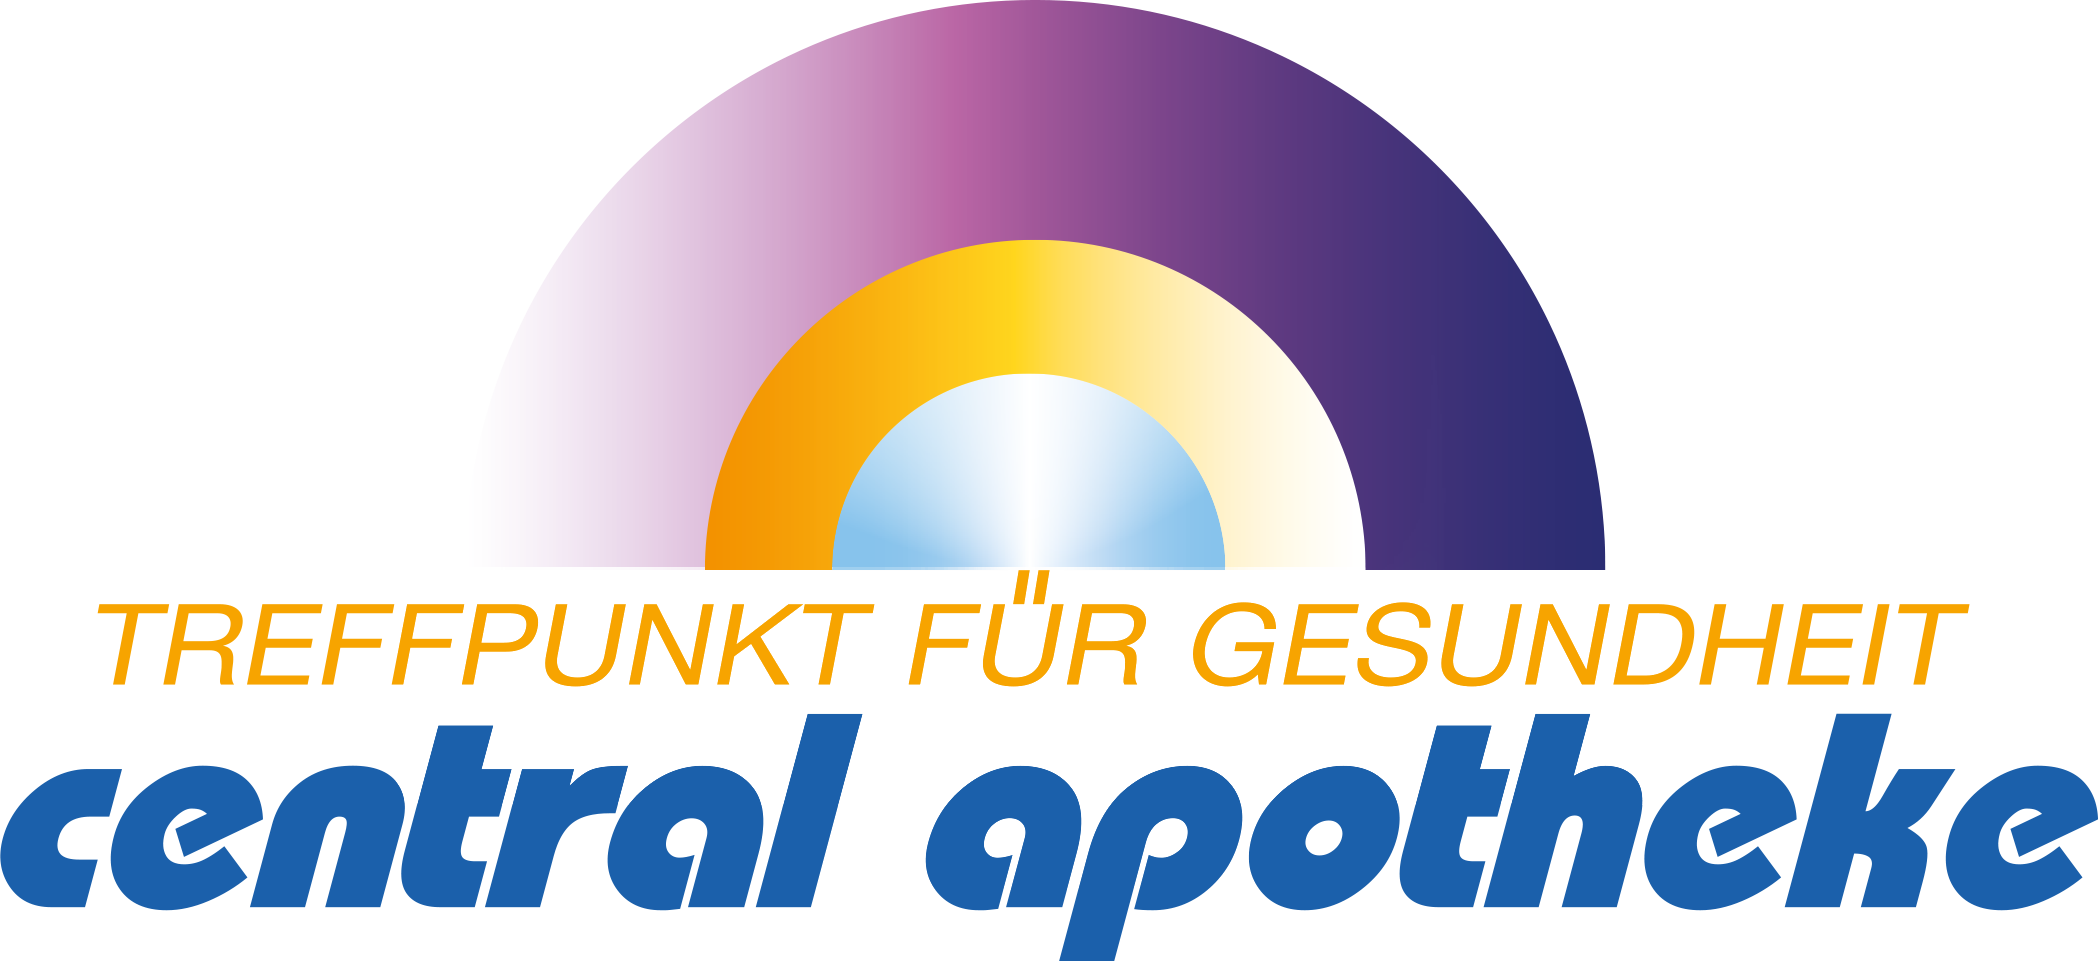 Central Apotheke, Karlsbad